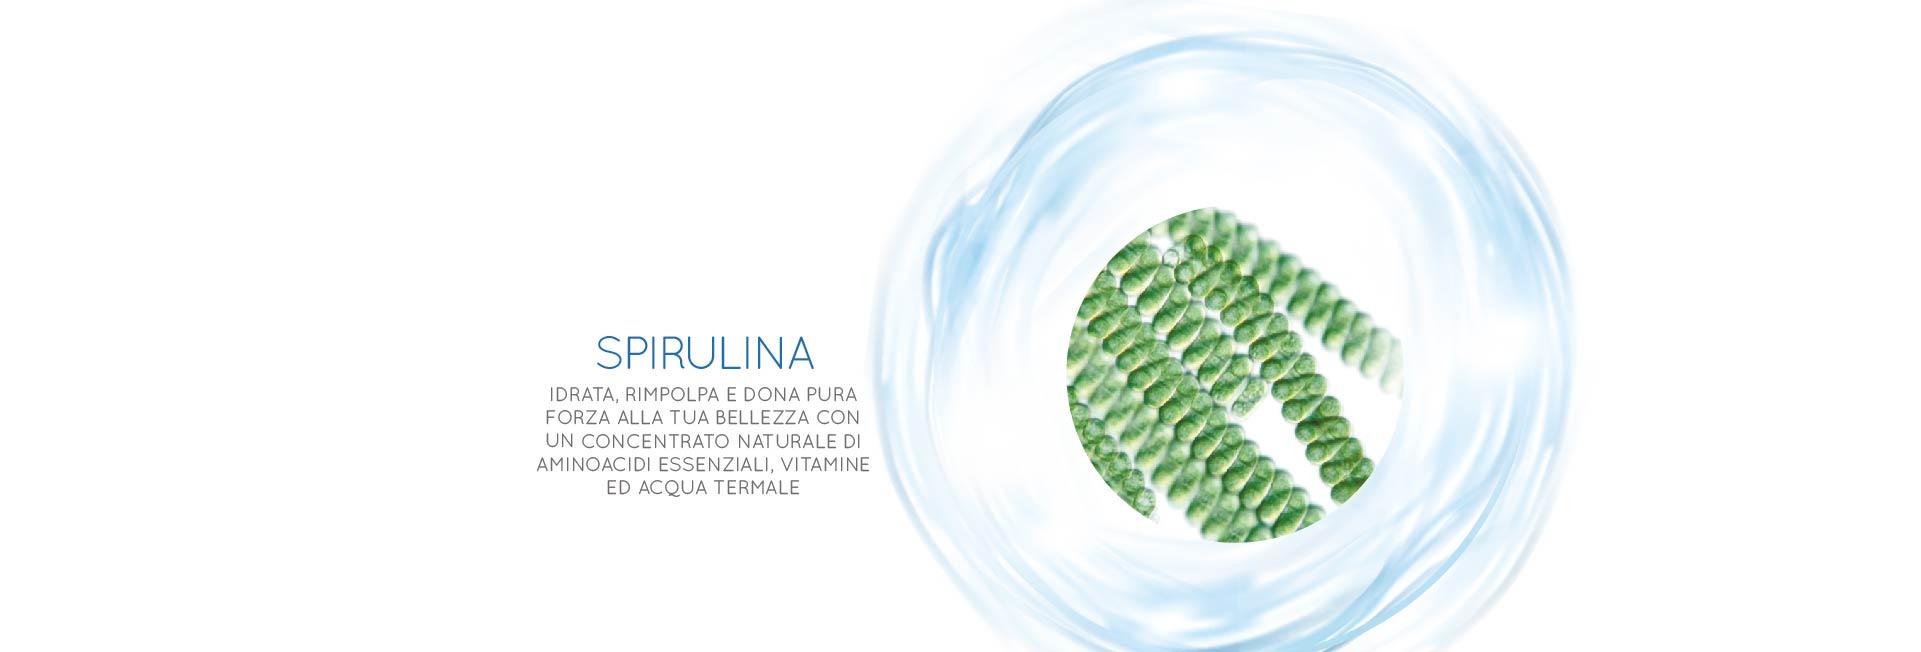 dermoalgae-bellezza-viso_spirulina